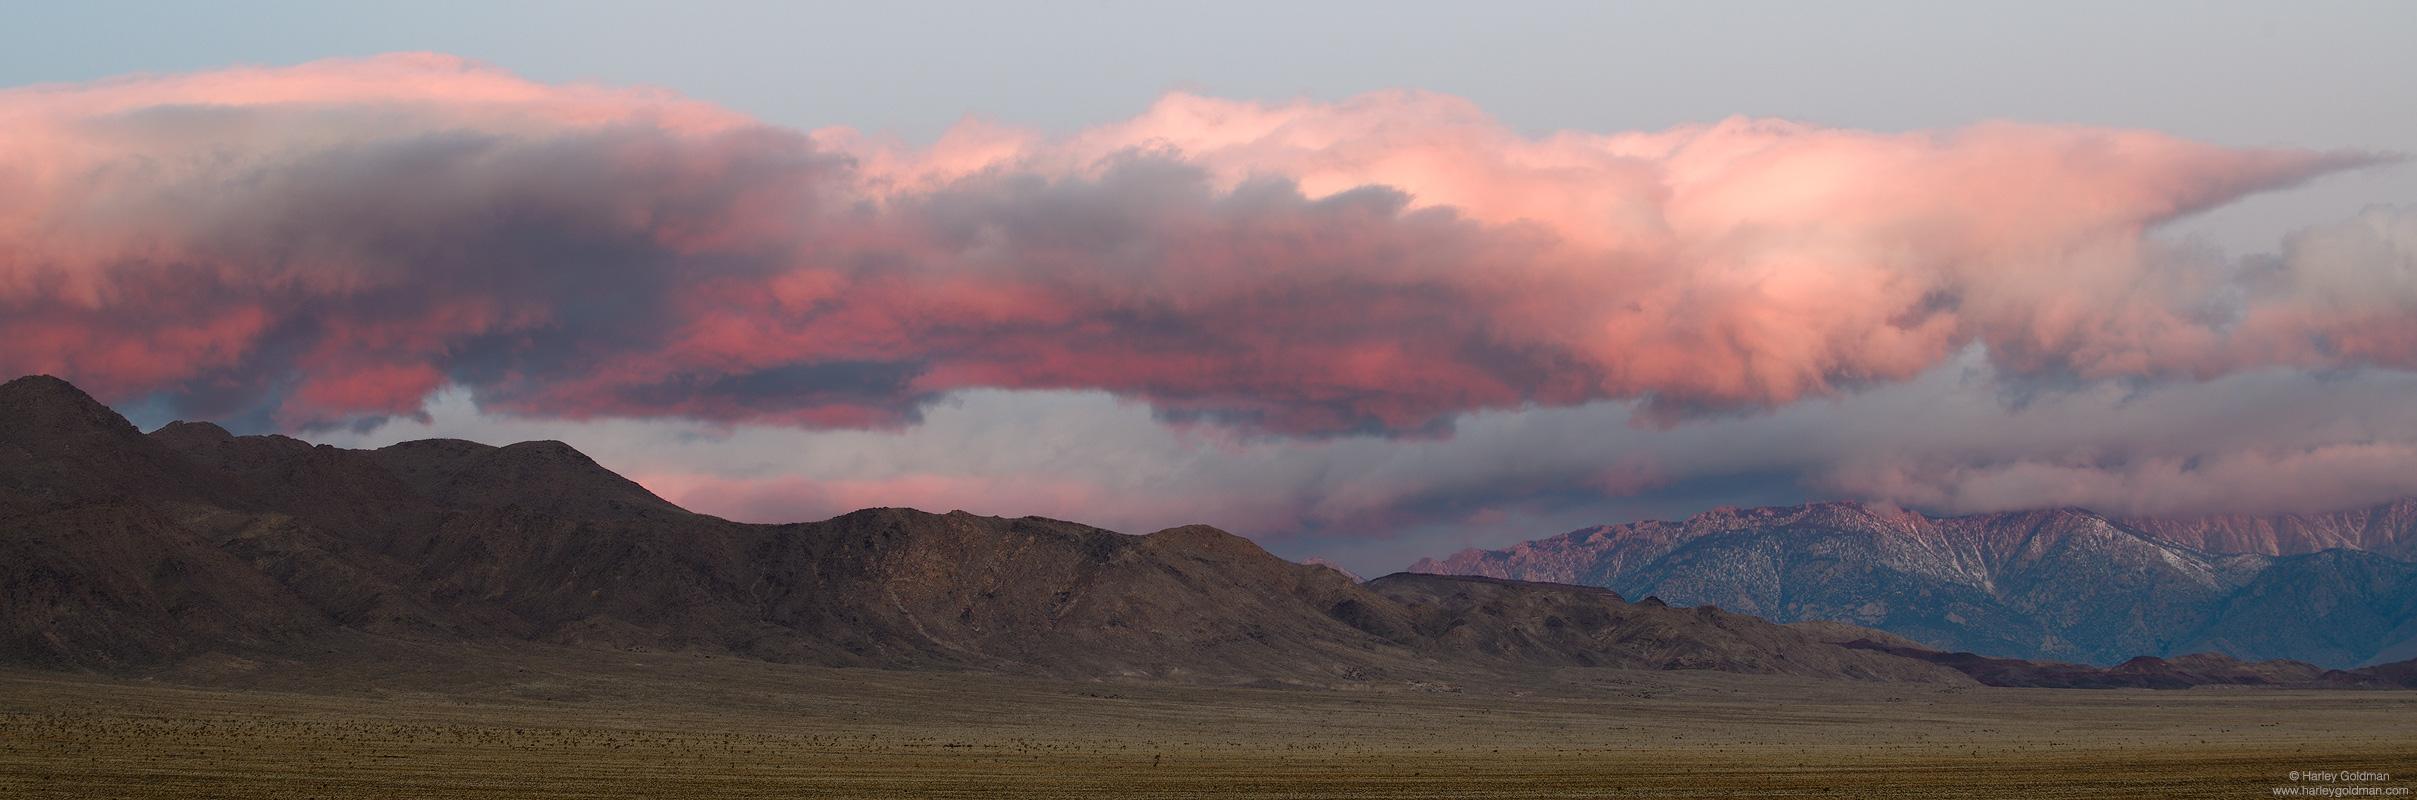 sunrise, pink, death valley, sierra, nevada, mountain, mountains, desert, cloud, clouds